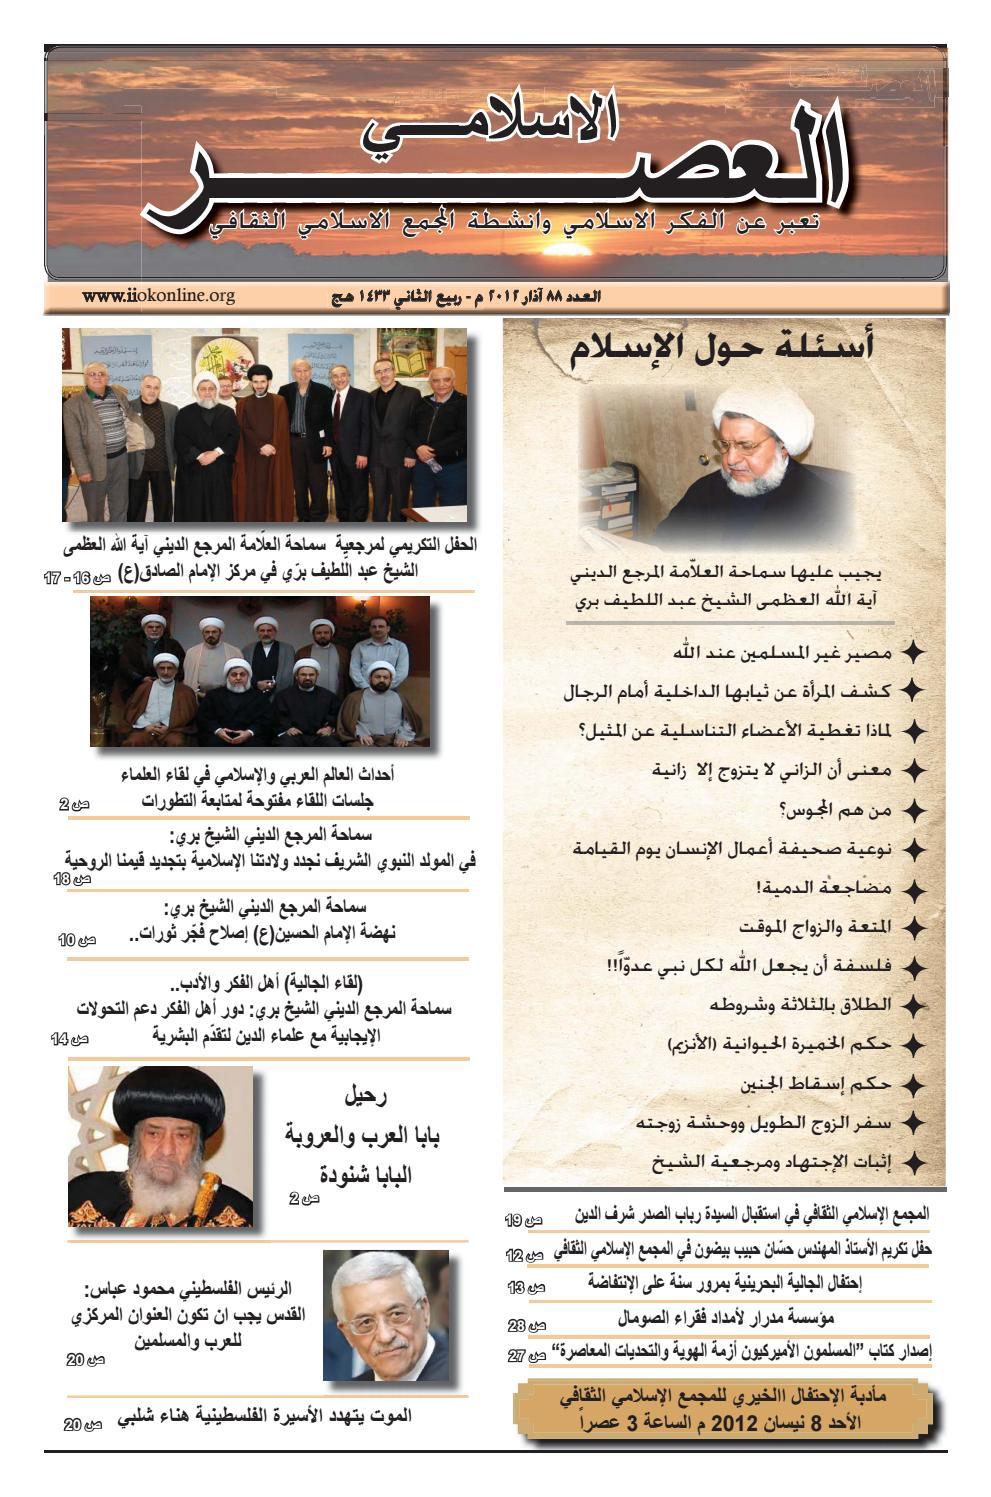 afe02b13e7673 Islamic times issue 88 by iiokonline - issuu